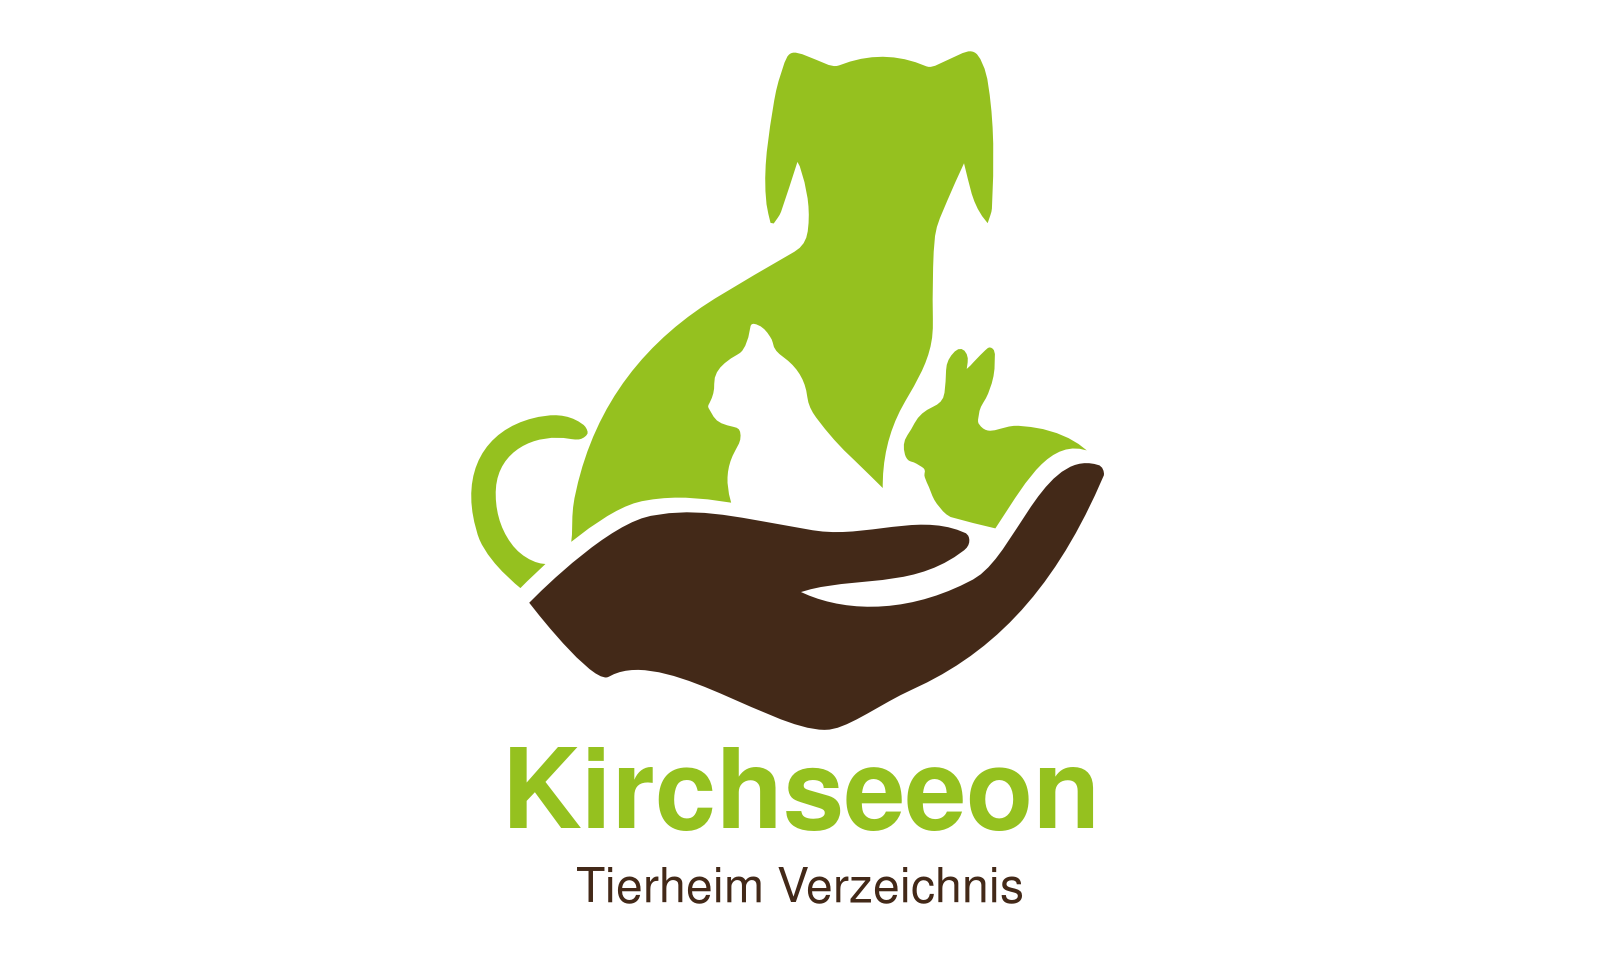 Tierheim Kirchseeon